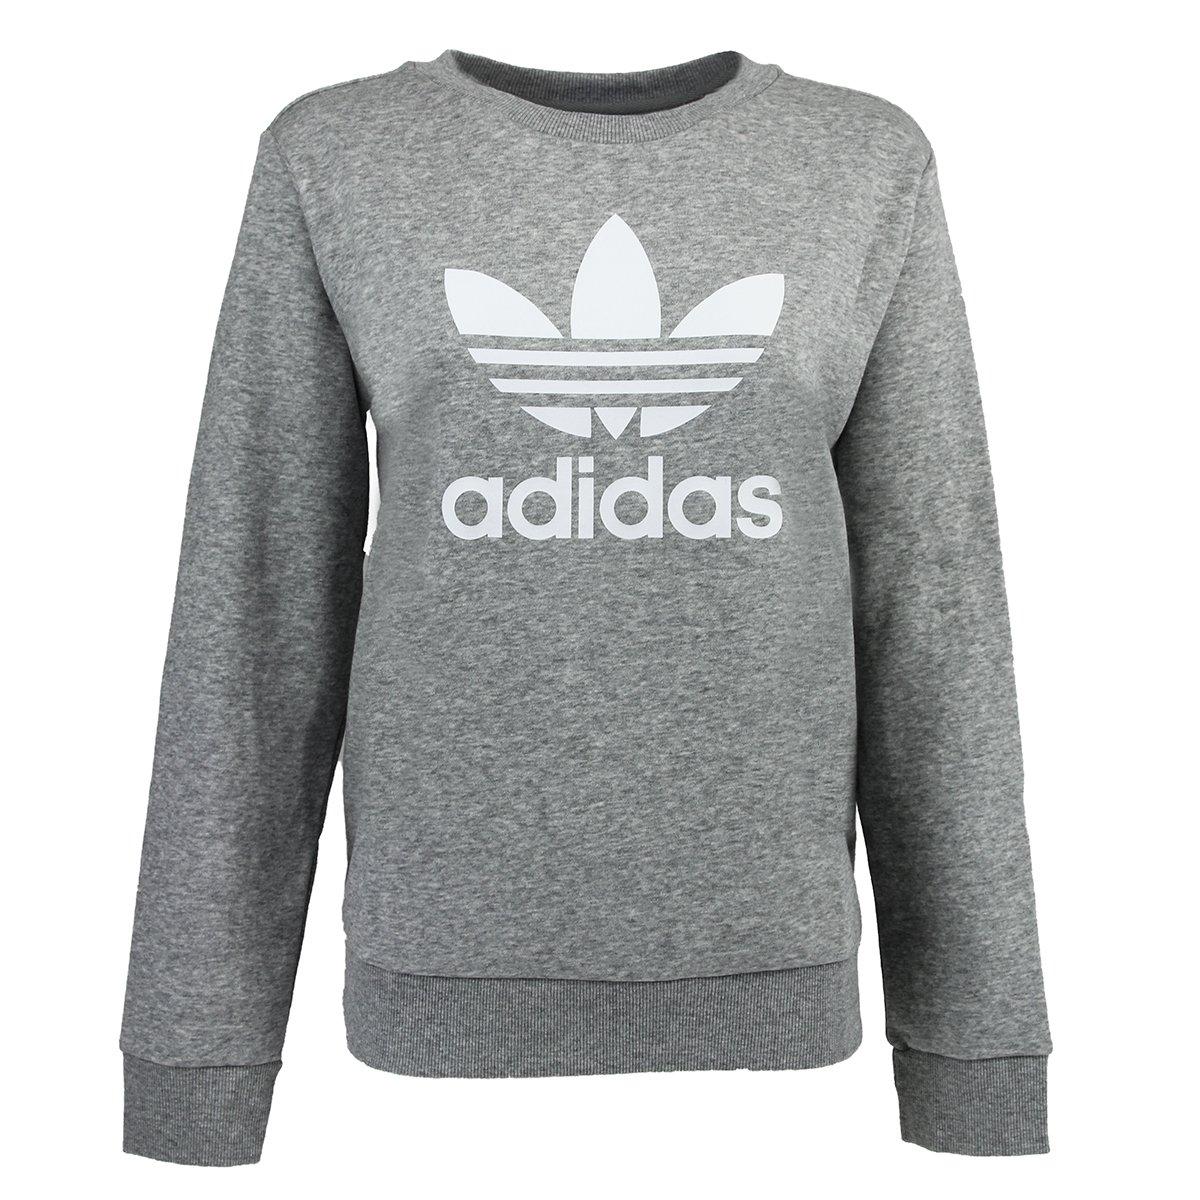 adidas Originals Womens Chiffon Crewneck Sweatshirt Sweater Pullover Jumper Top